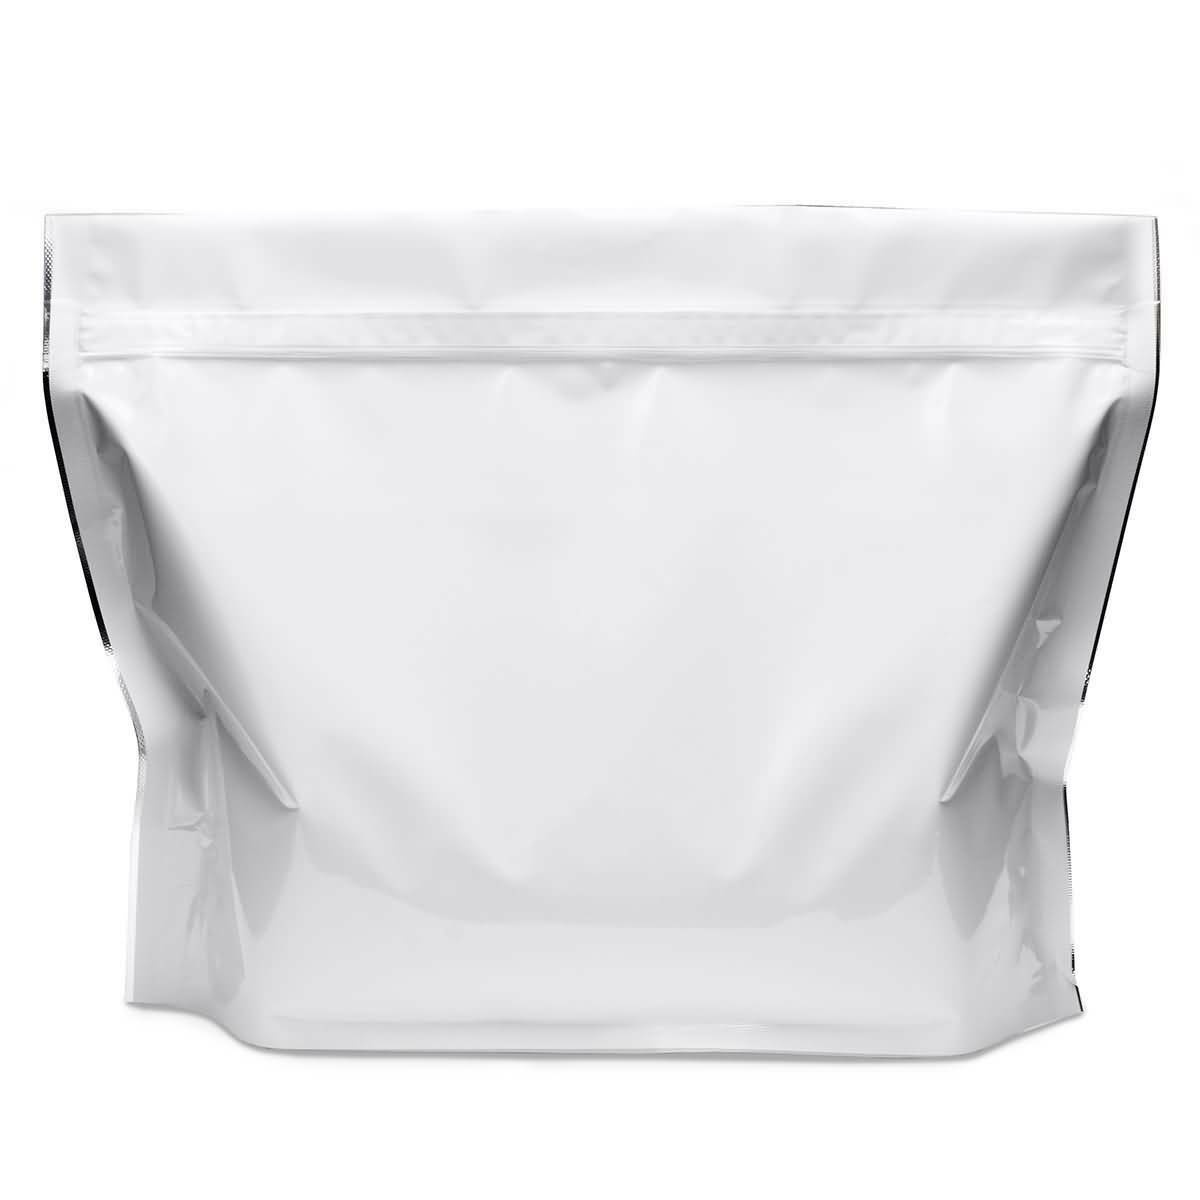 2222 1 White Child Resistant 12×9×4 (Exit Bag) – 100 Pack